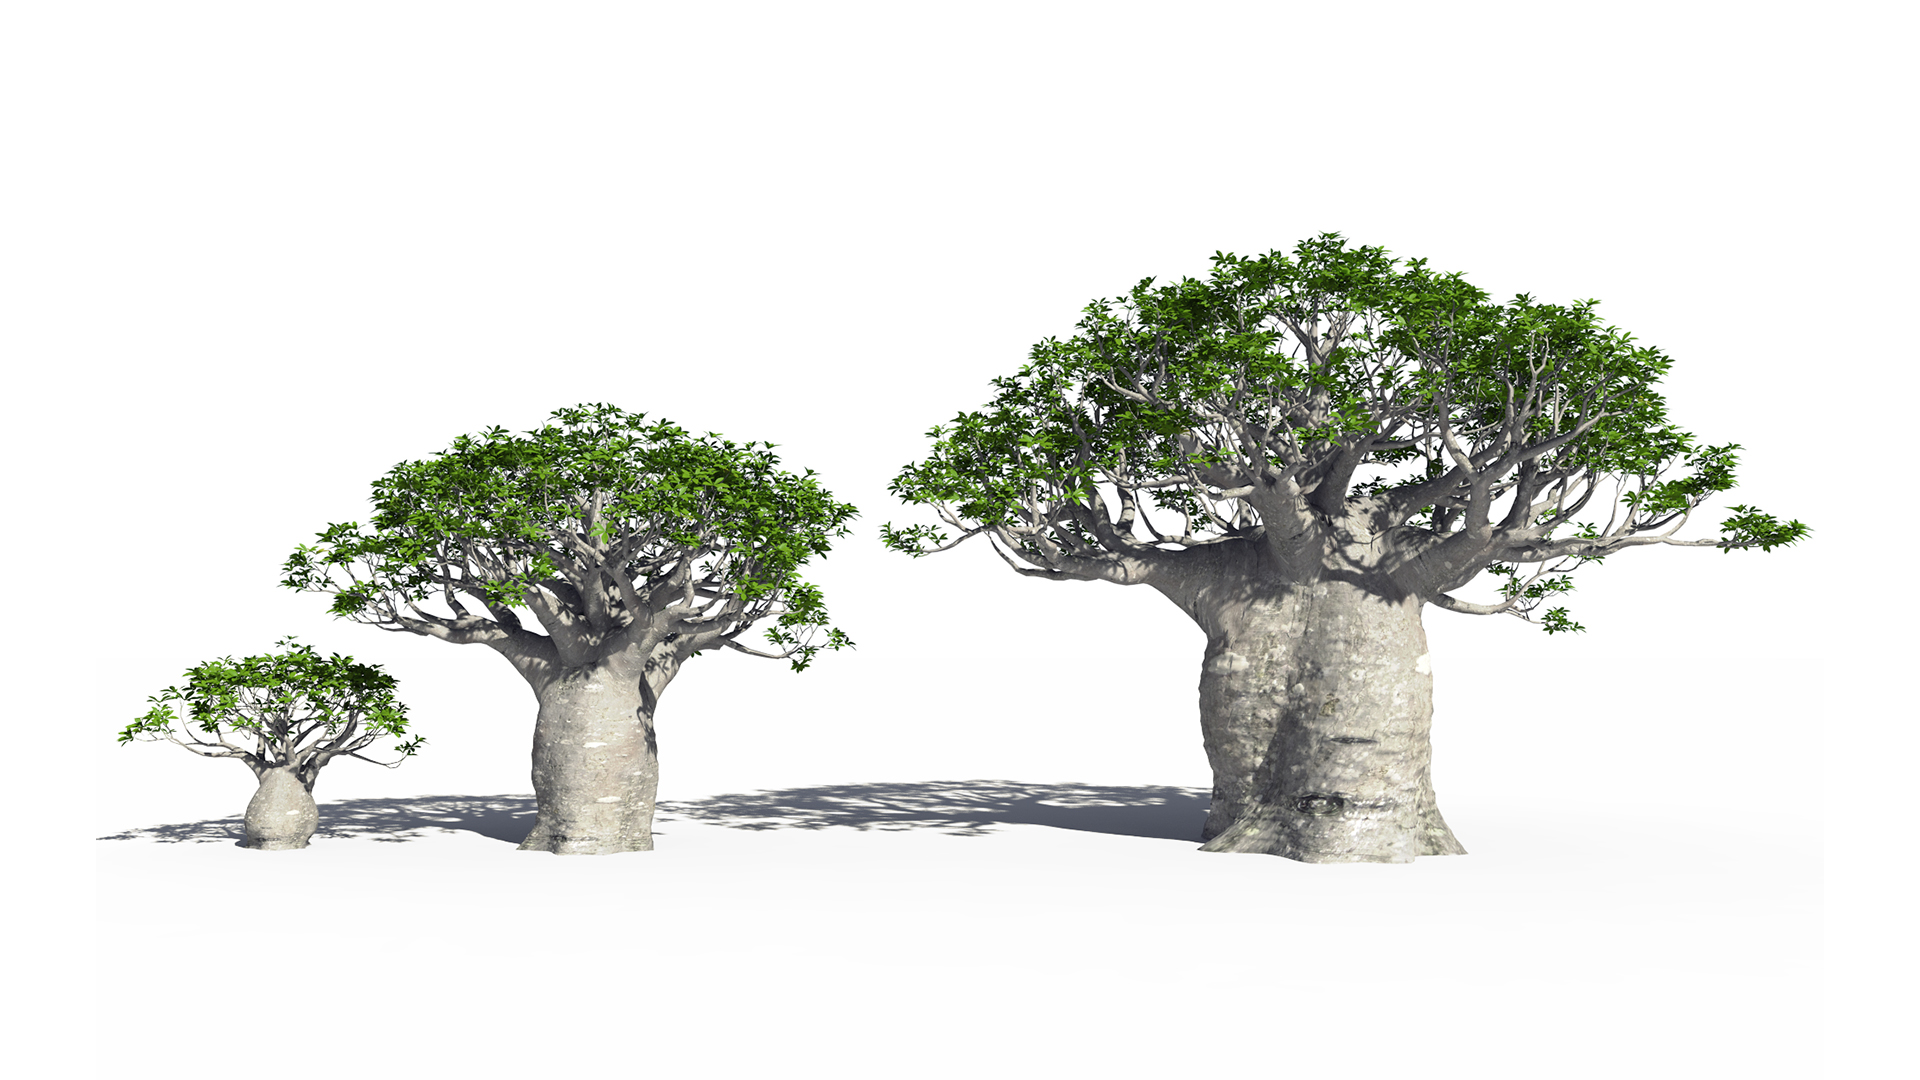 3D model of the African continental baobab Adansonia digitata maturity variations